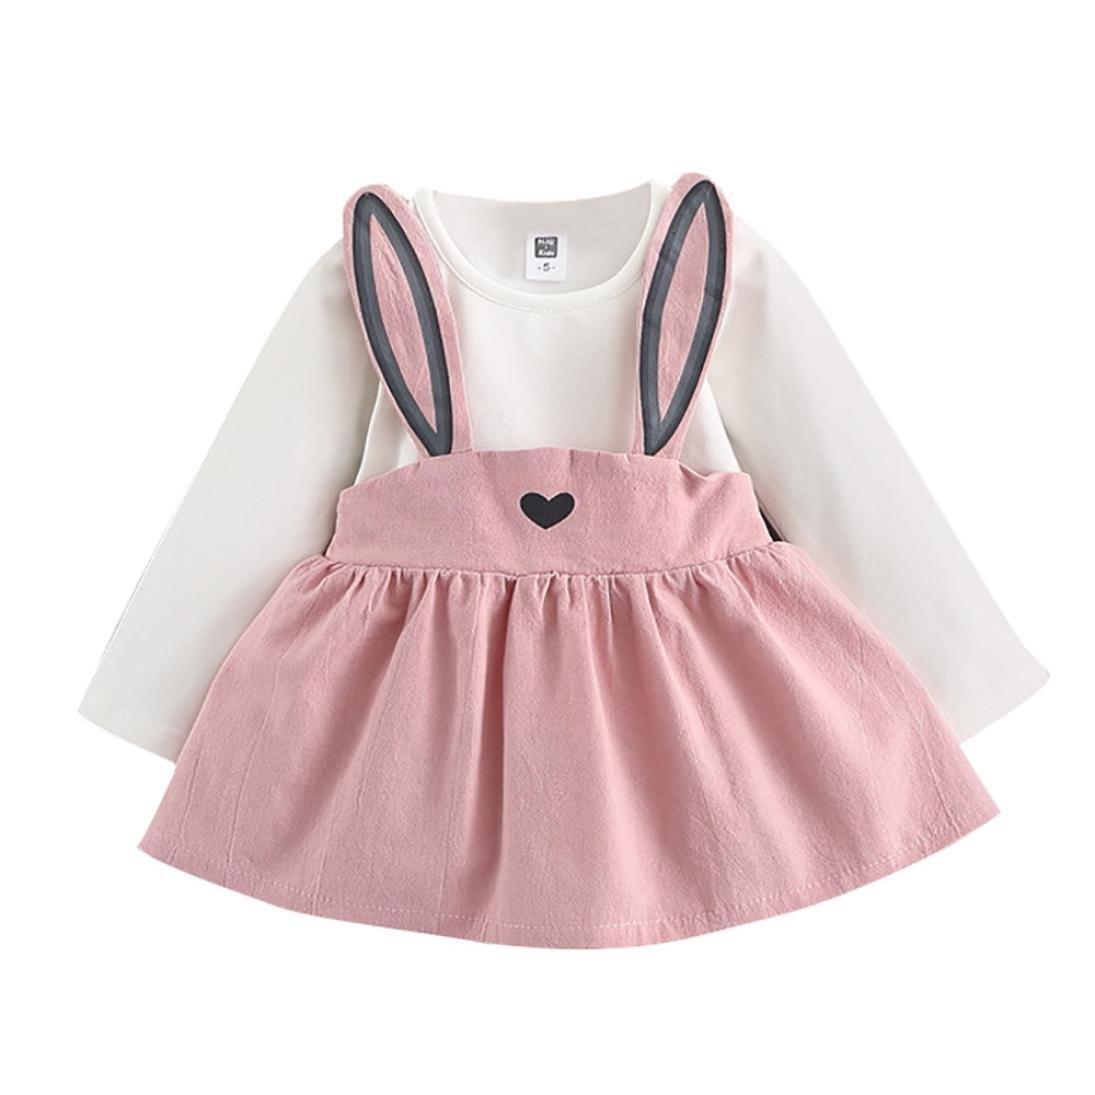 Autumn Baby Kids Toddler Girl Cute Rabbit Bandage Suit Mini Dress 0-3Y